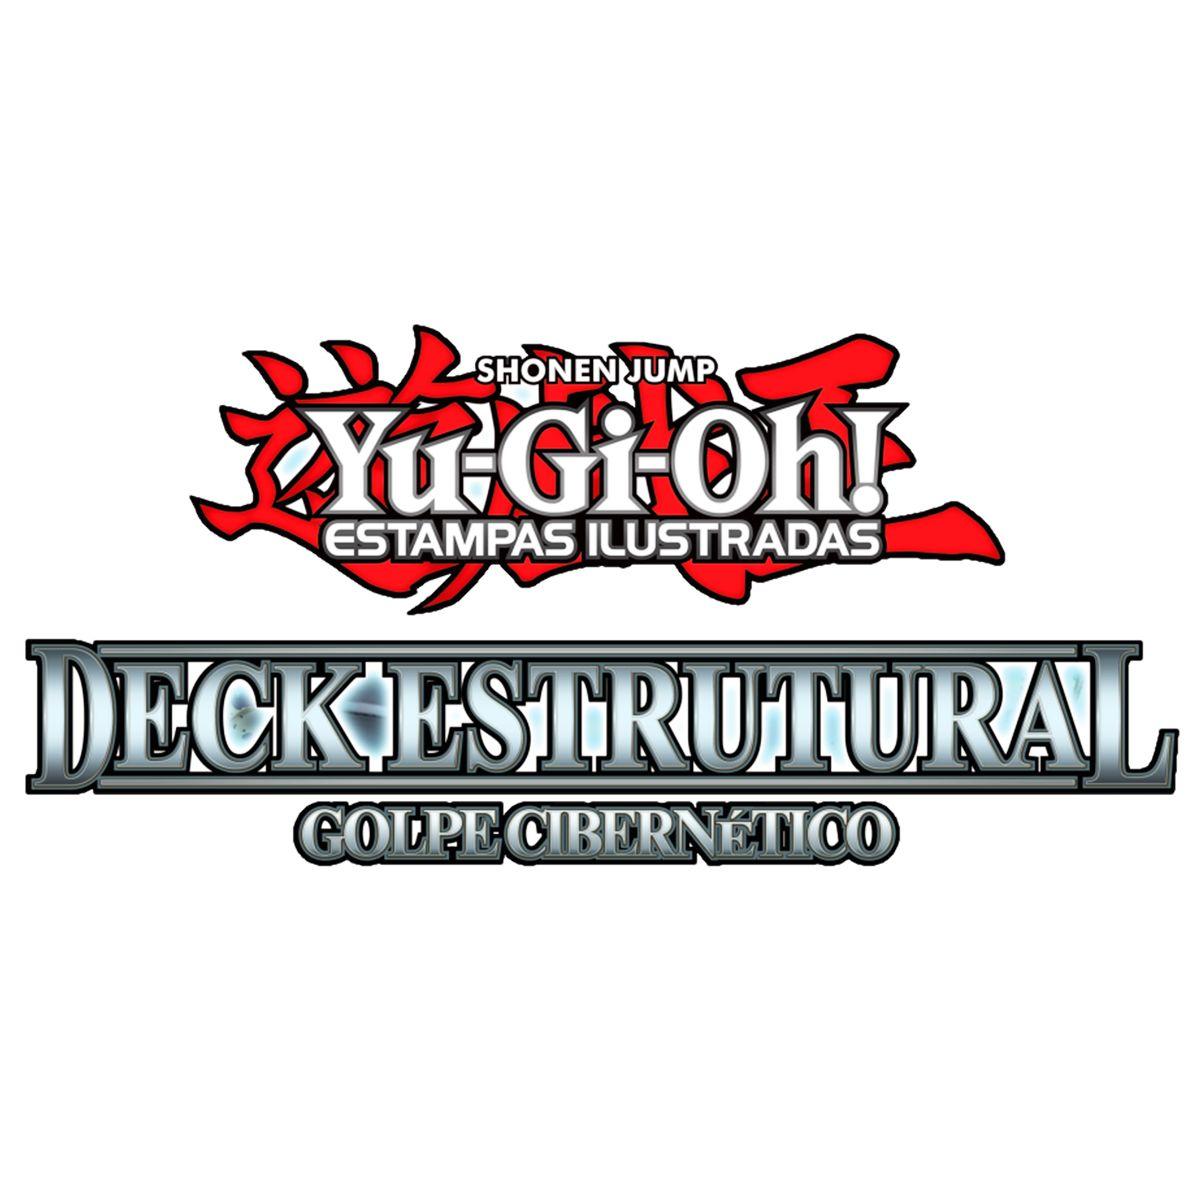 Yugioh Deck Estrutural Golpe Cibernético - Cyber Strike